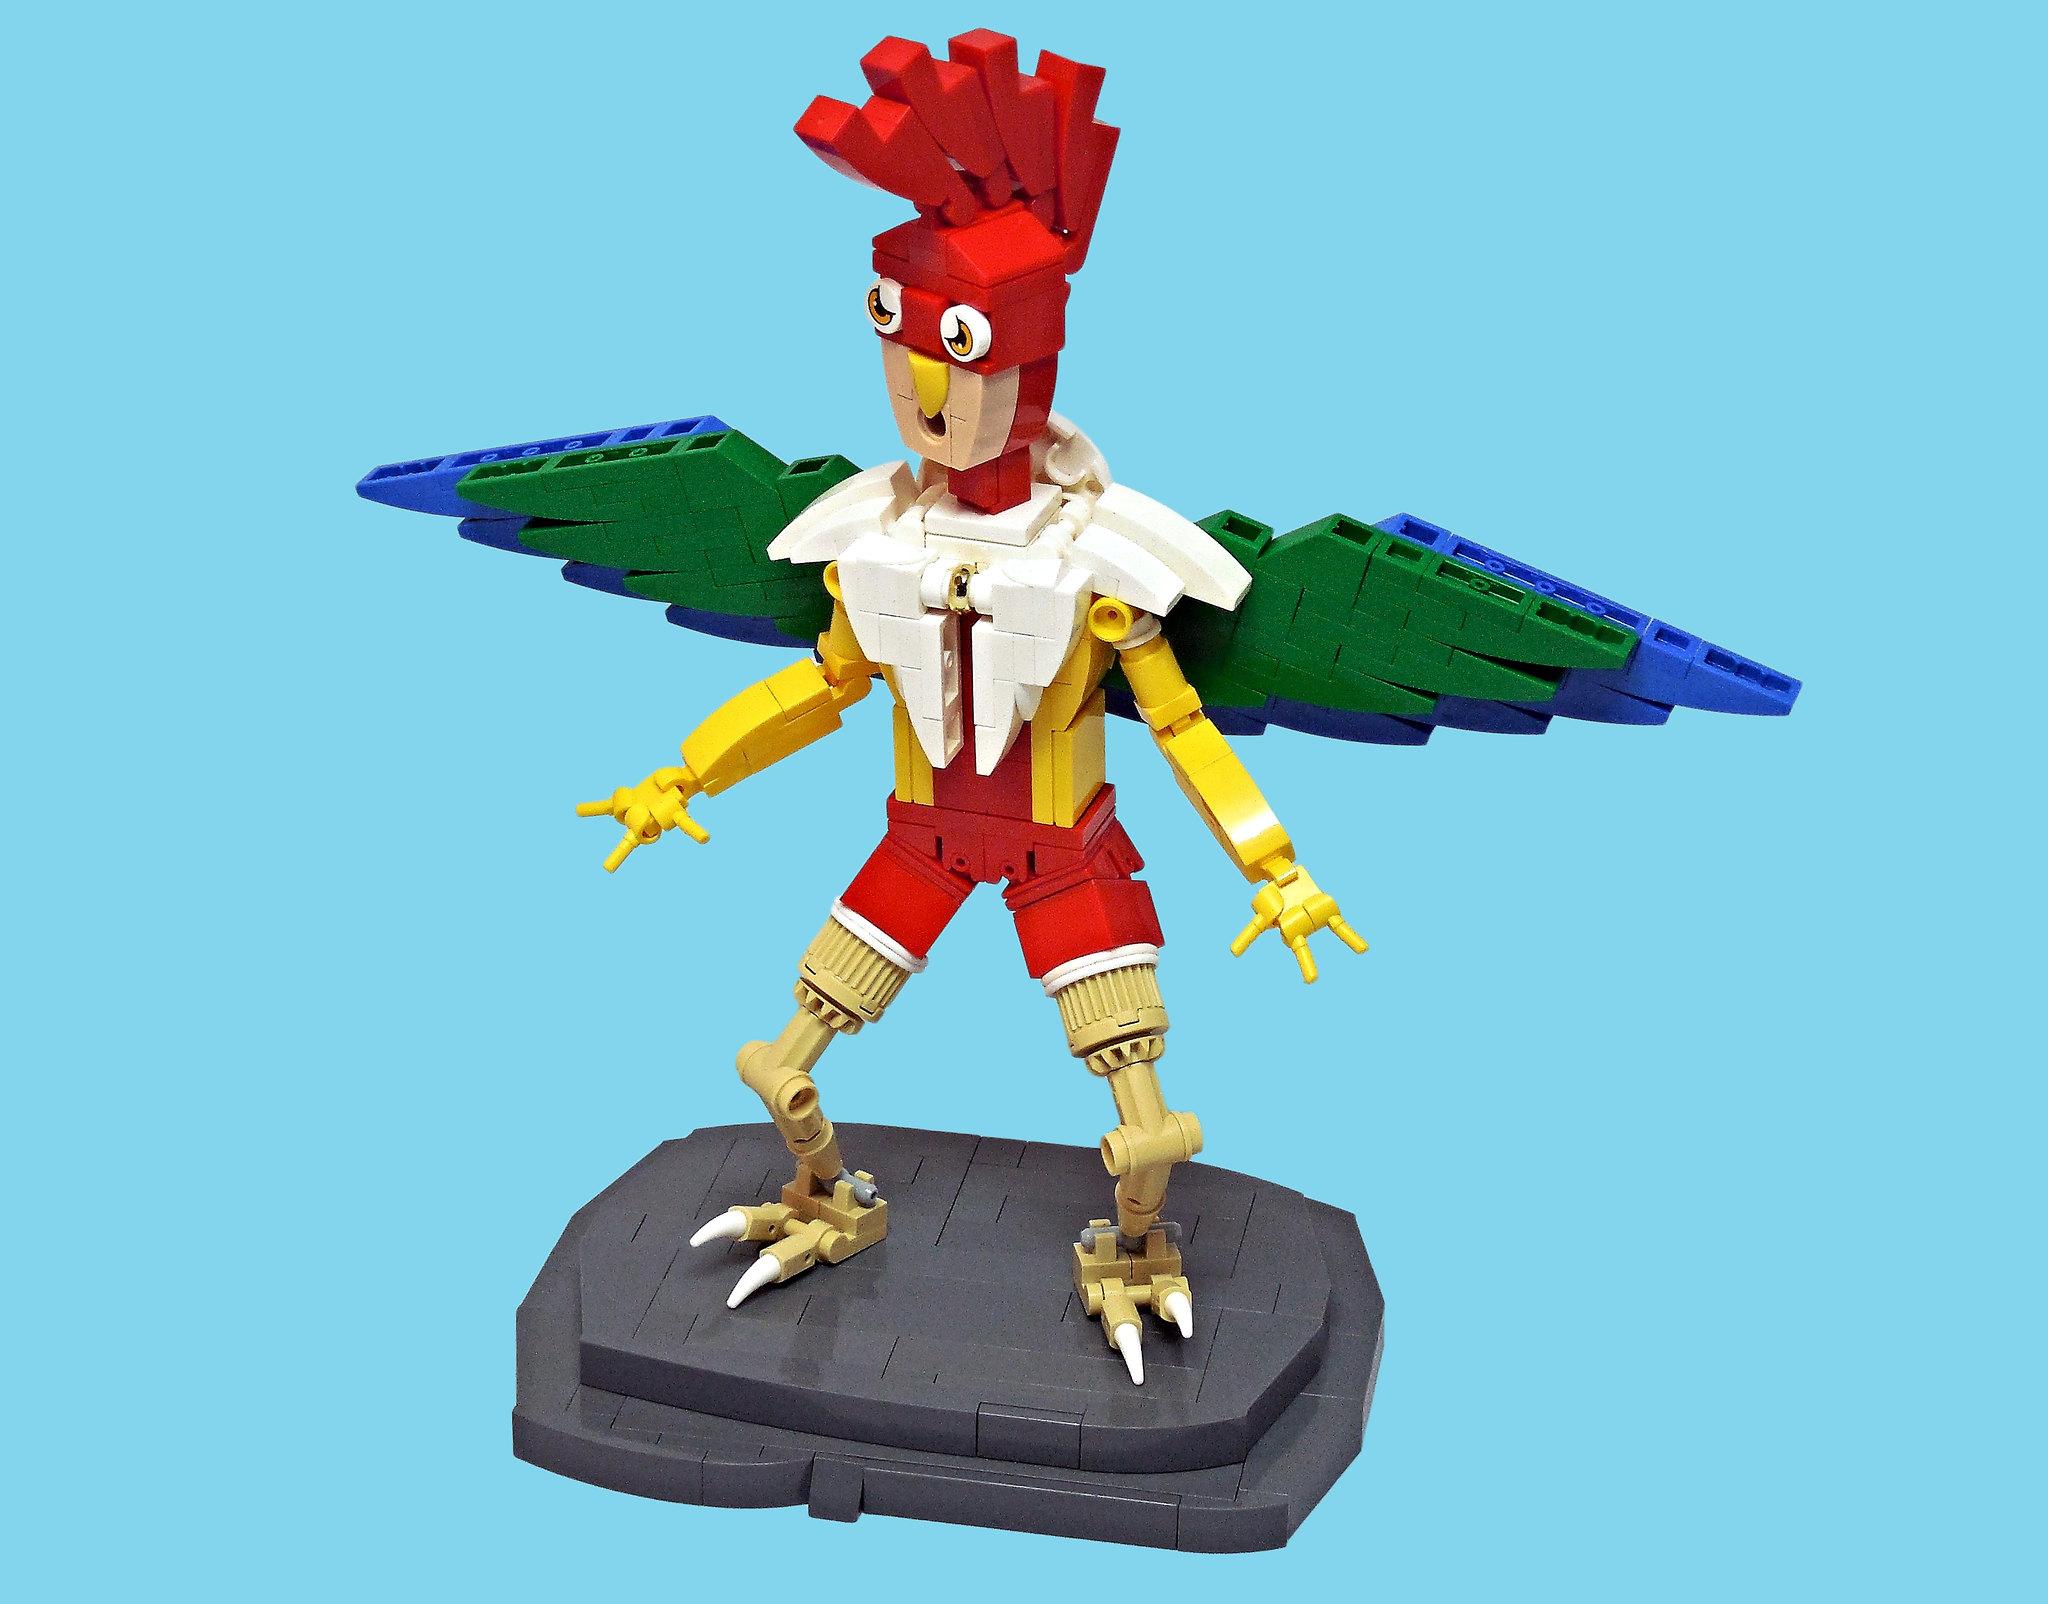 LEGO® MOC by Vitreolum: Parrot Laddie